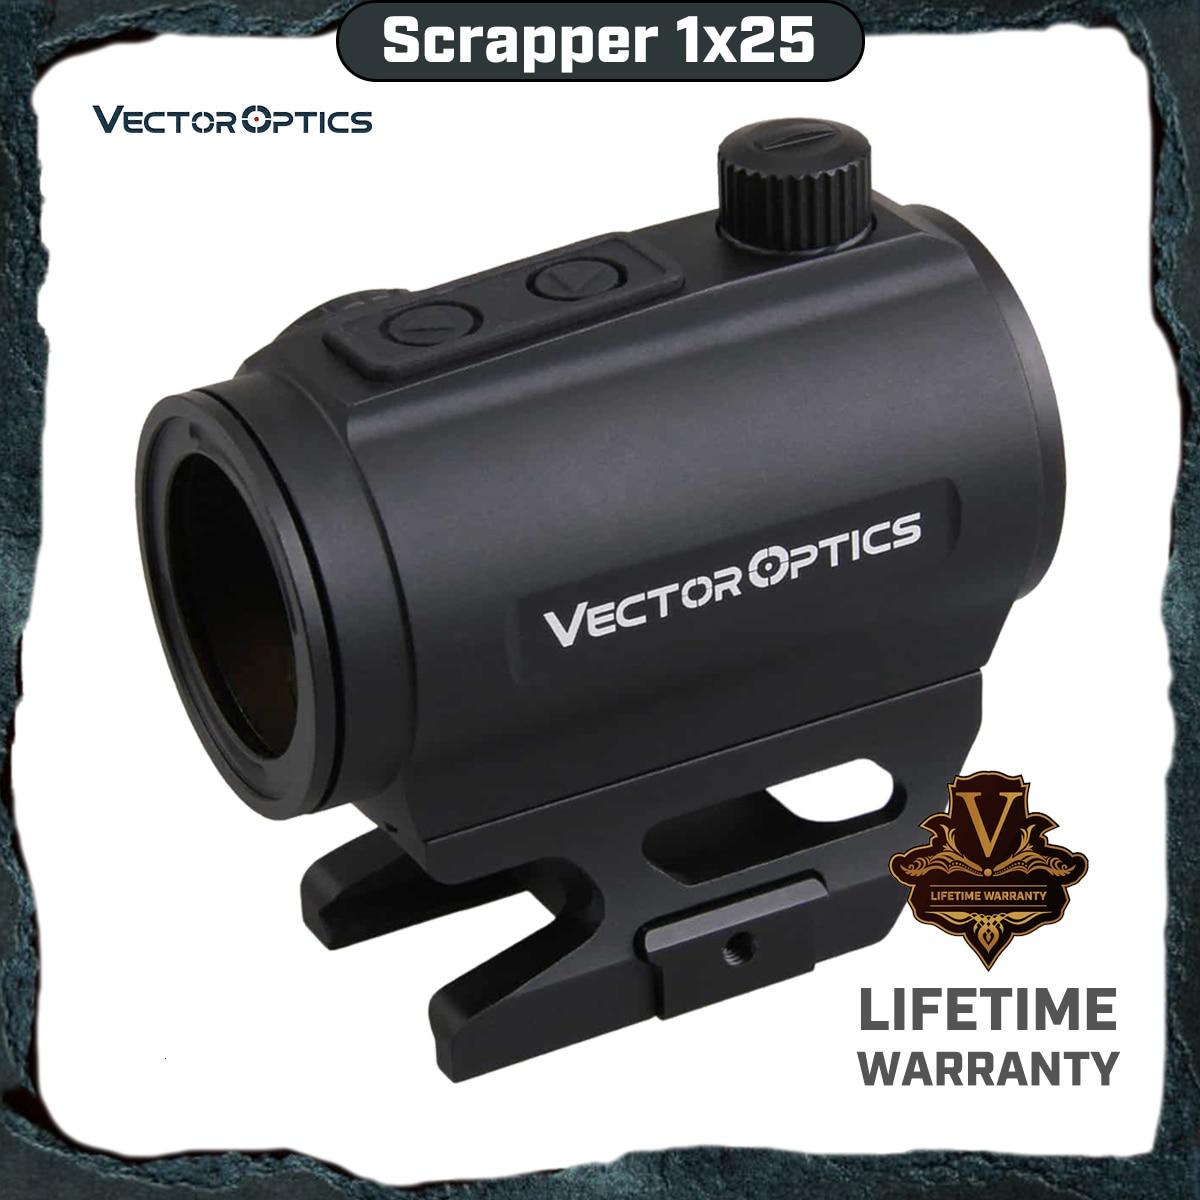 Vector Optics Scrapper 1x25 Red Dot Scope 2MOA Dot Size IPX6 ajuste a prueba de agua NV para la vista AR15 se apaga automáticamente 4 horas